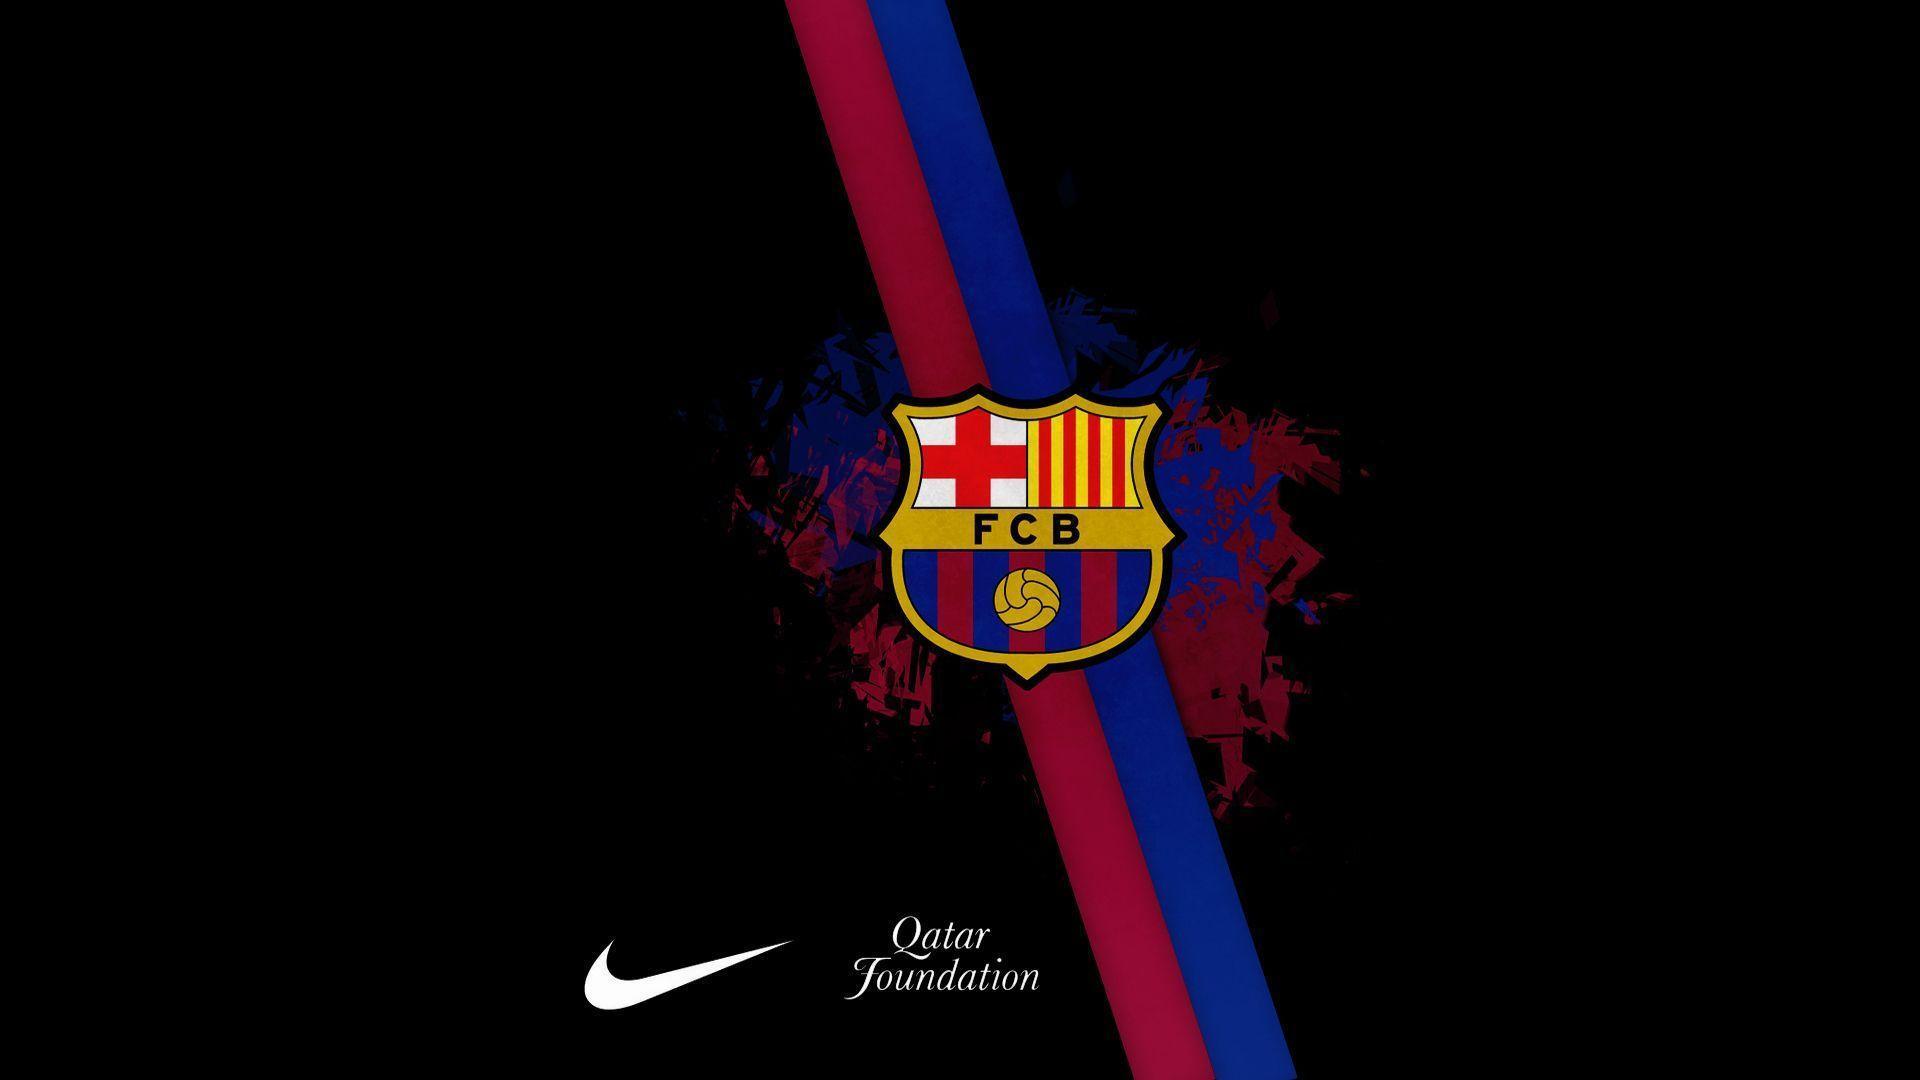 barcelona fc logo - Barcelona Wallpaper 1920x1080